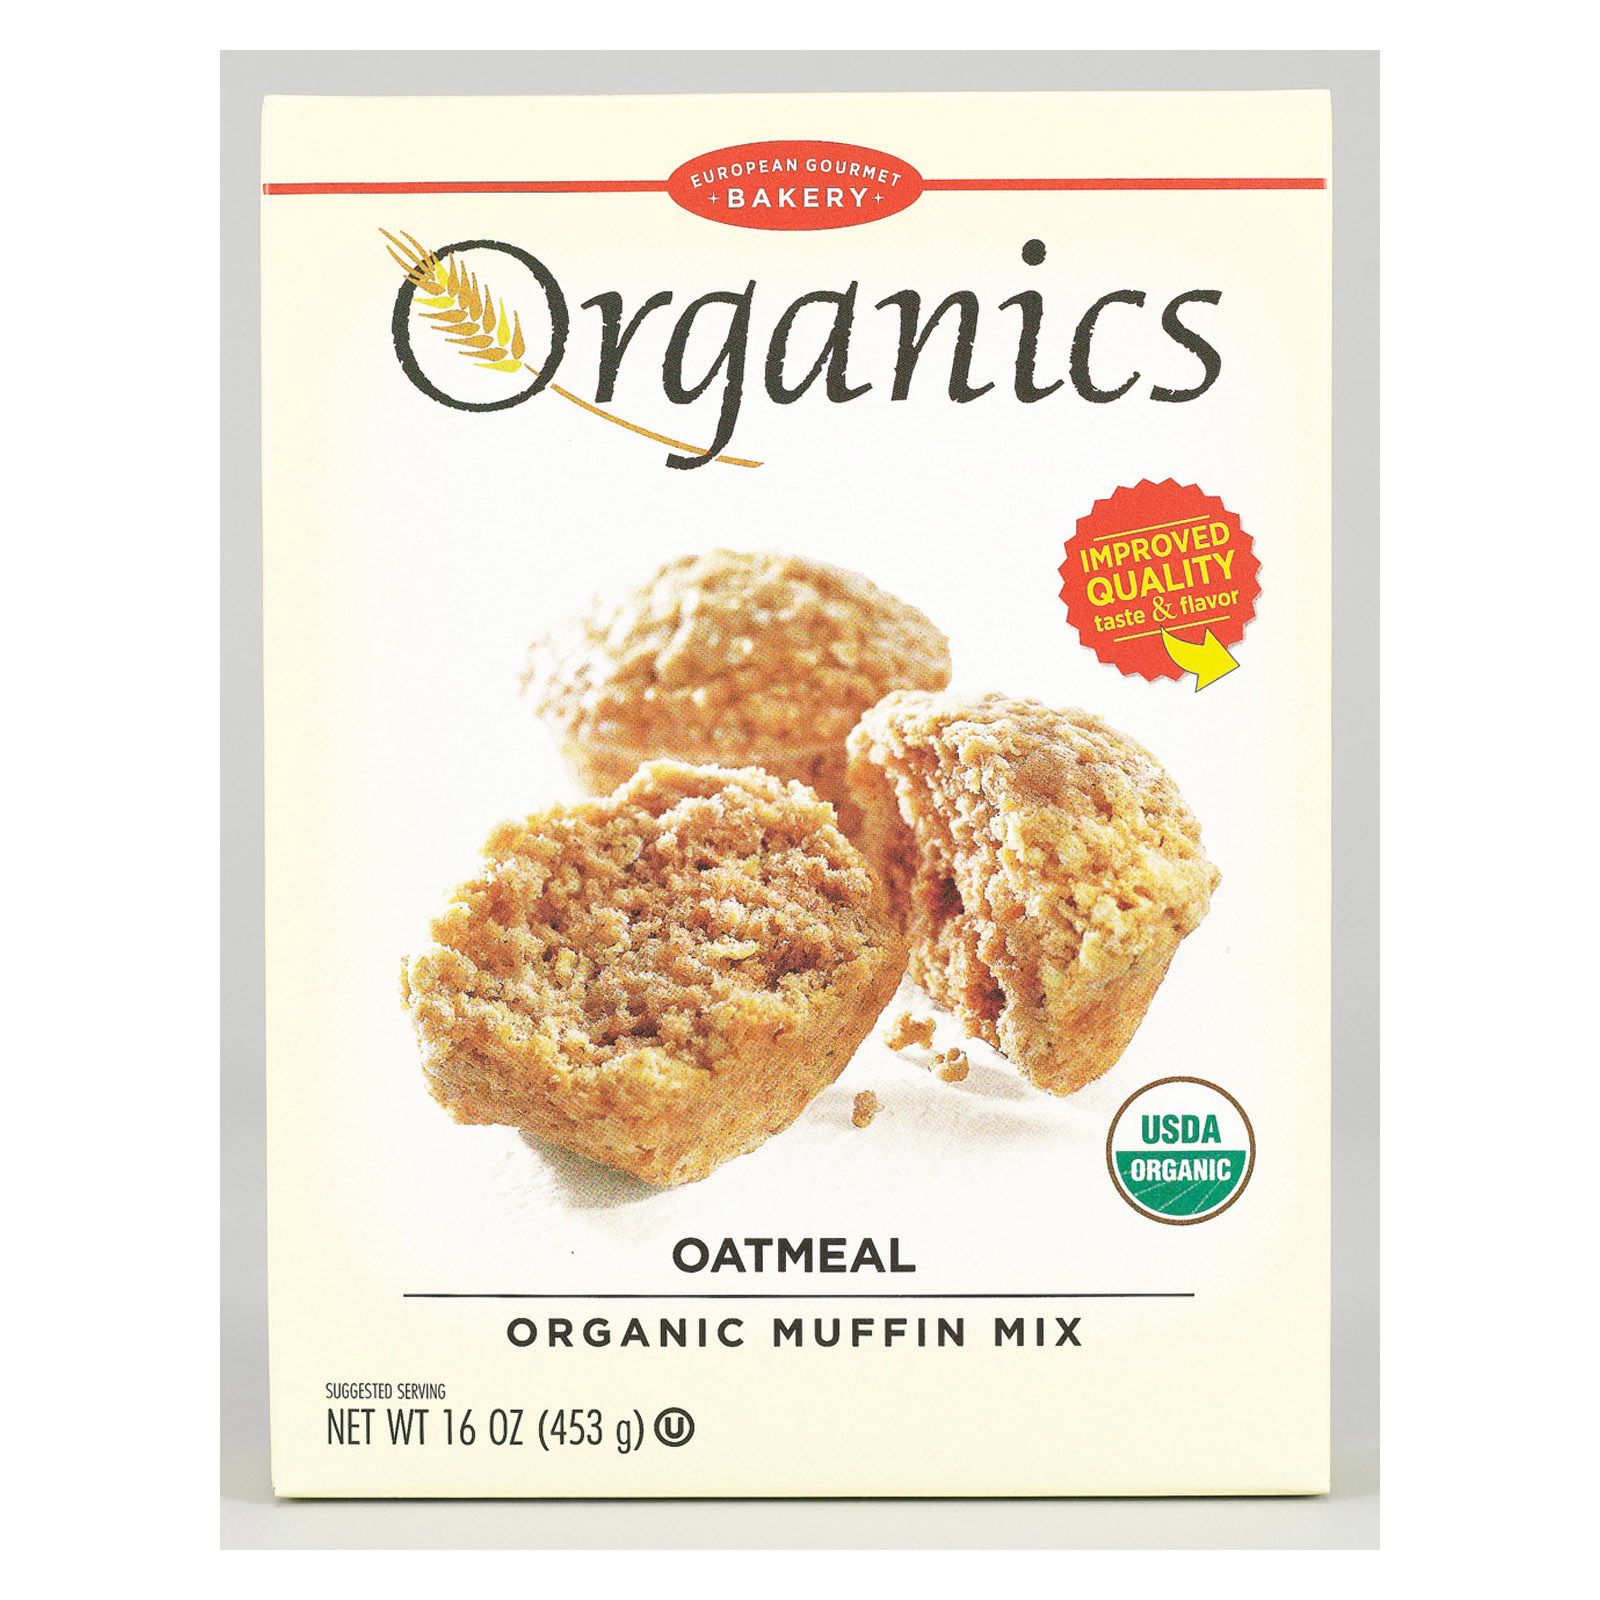 European Gourmet Bakery Organic Oatmeal Muffin Mix - Oatmeal - Case of 12 - 16 oz.